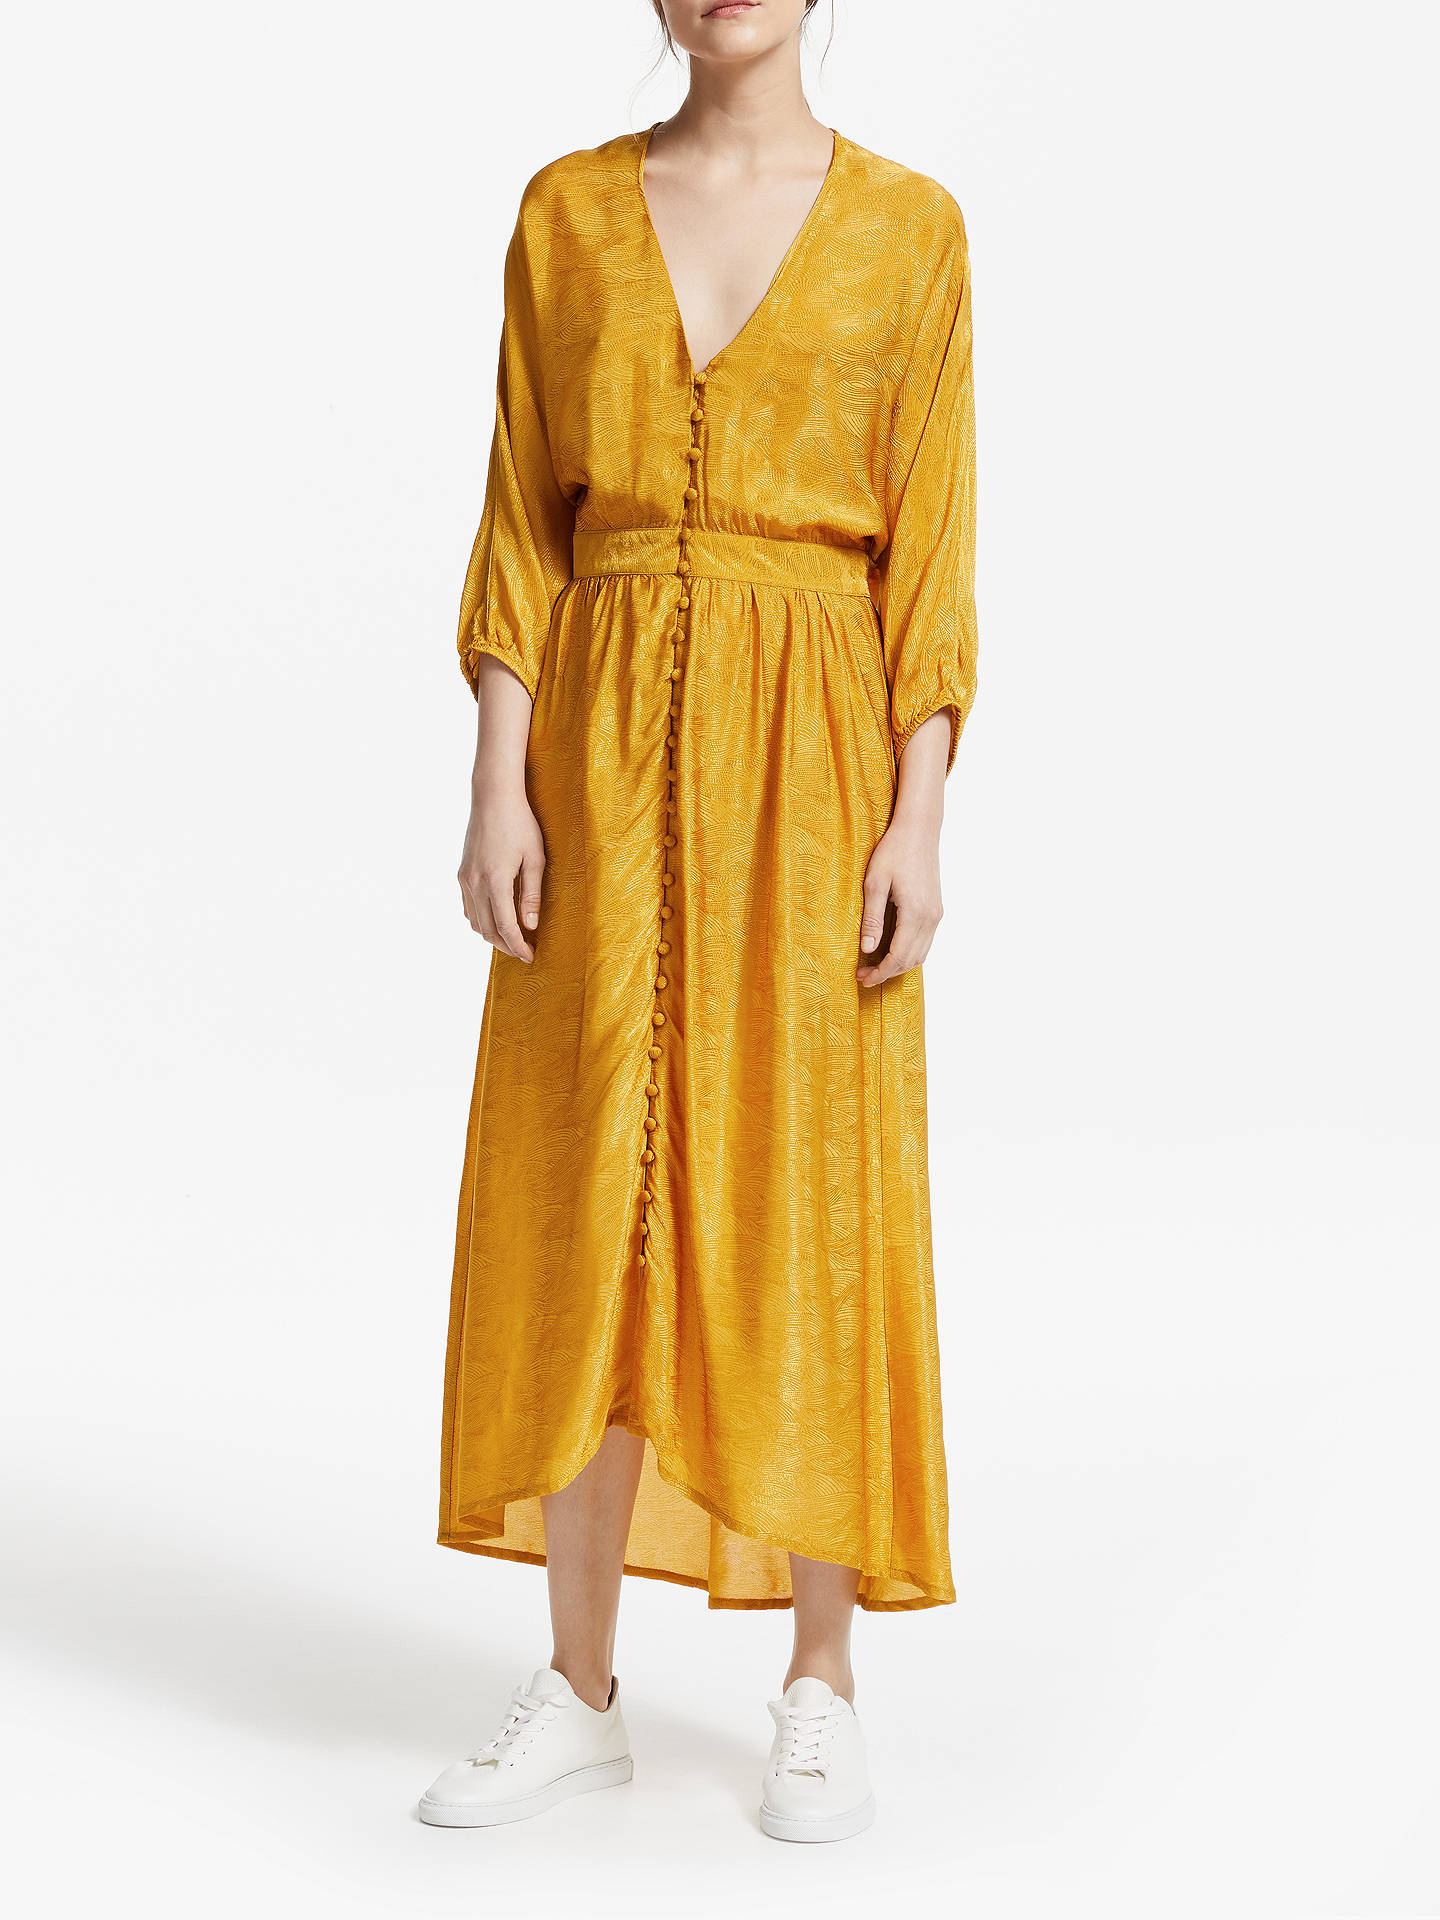 3fee13f8 Buy Gestuz Lilliane Dress, Yellow, 8 Online at johnlewis.com ...